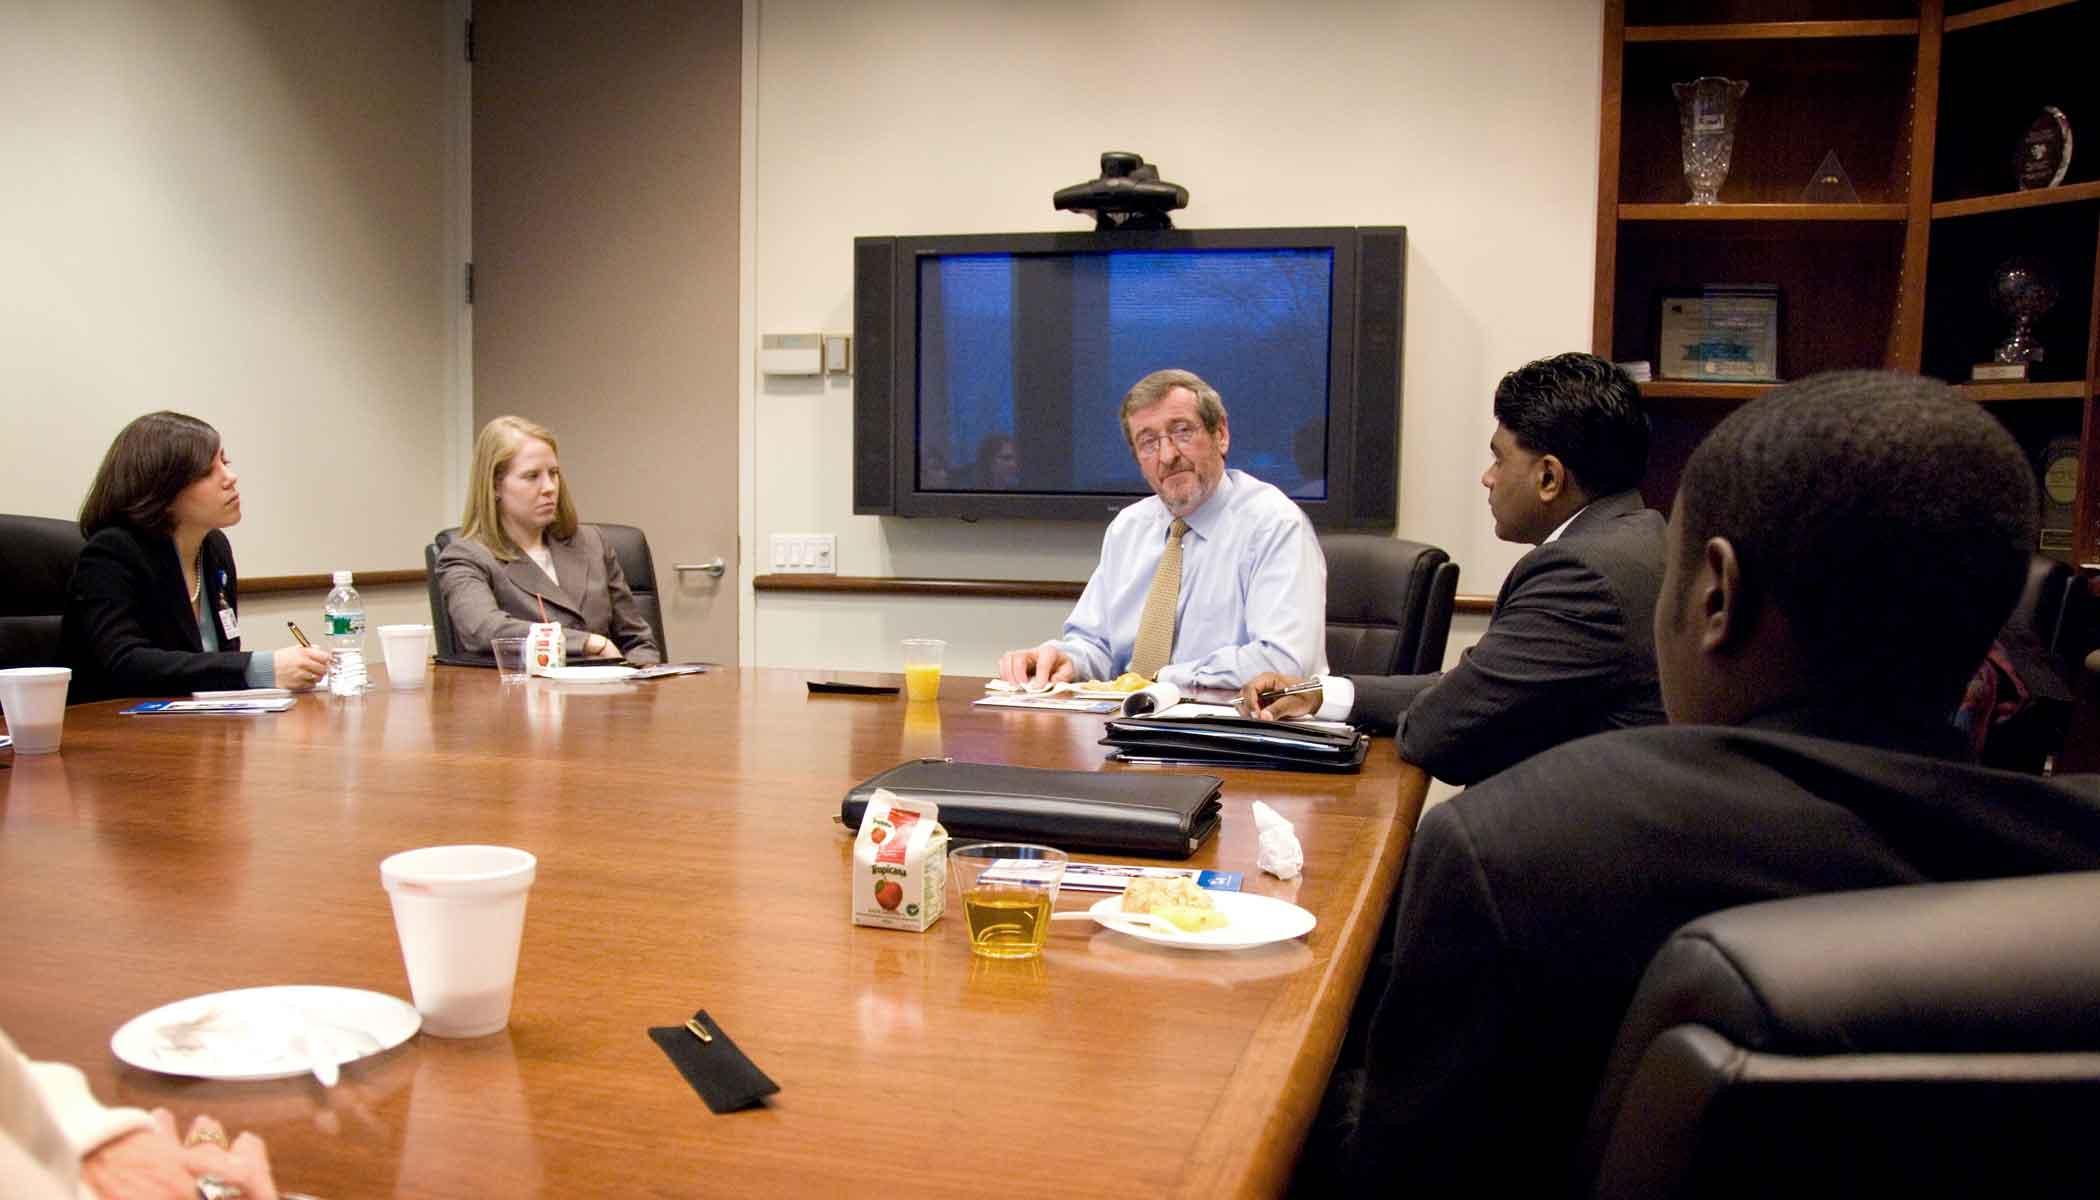 Michael speaks with administrators